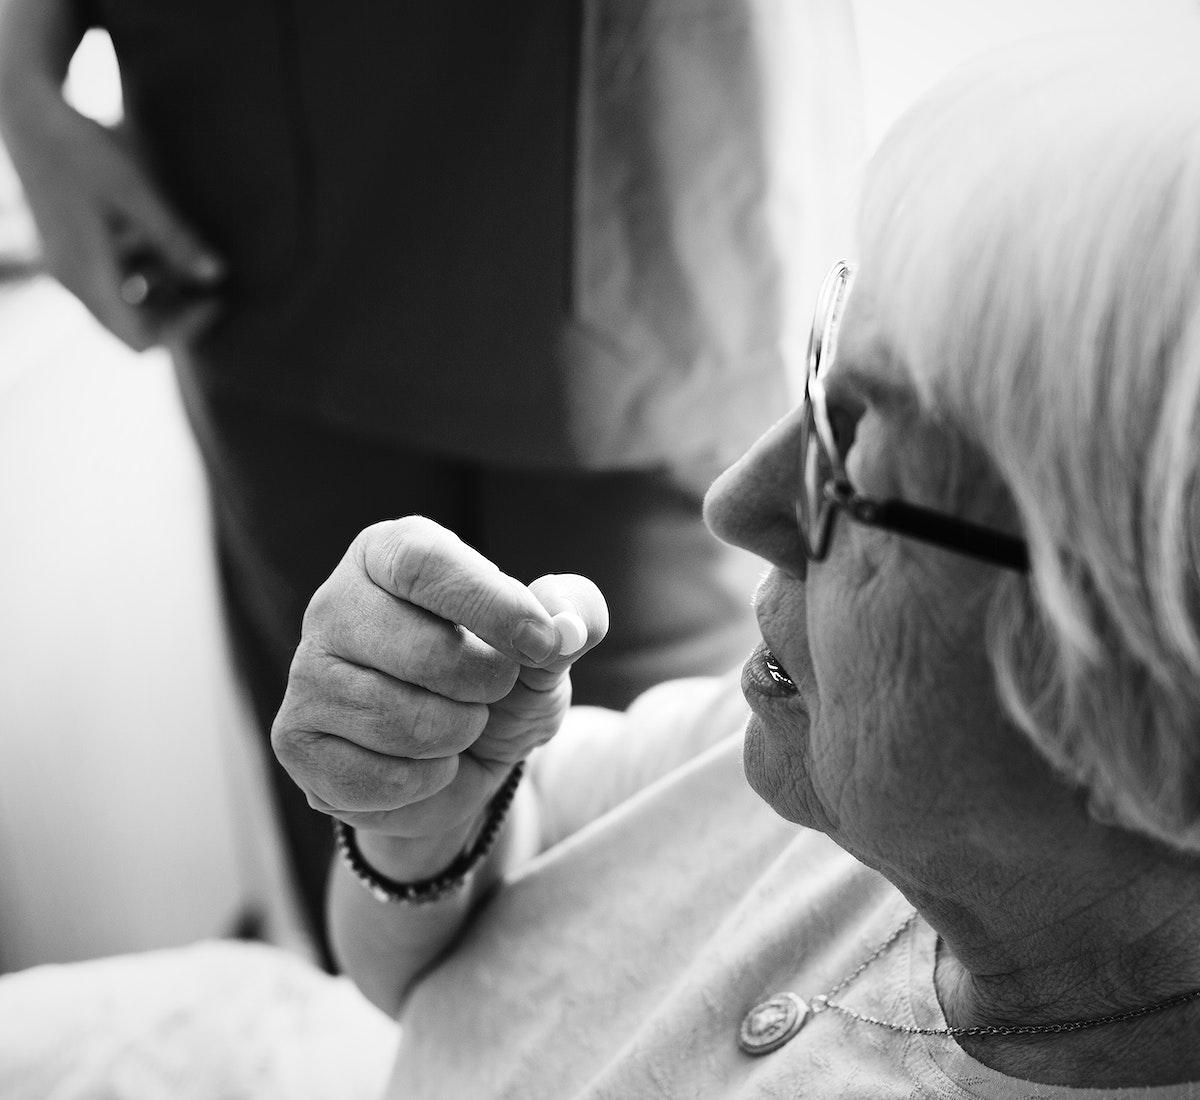 Senior woman taking some medicine